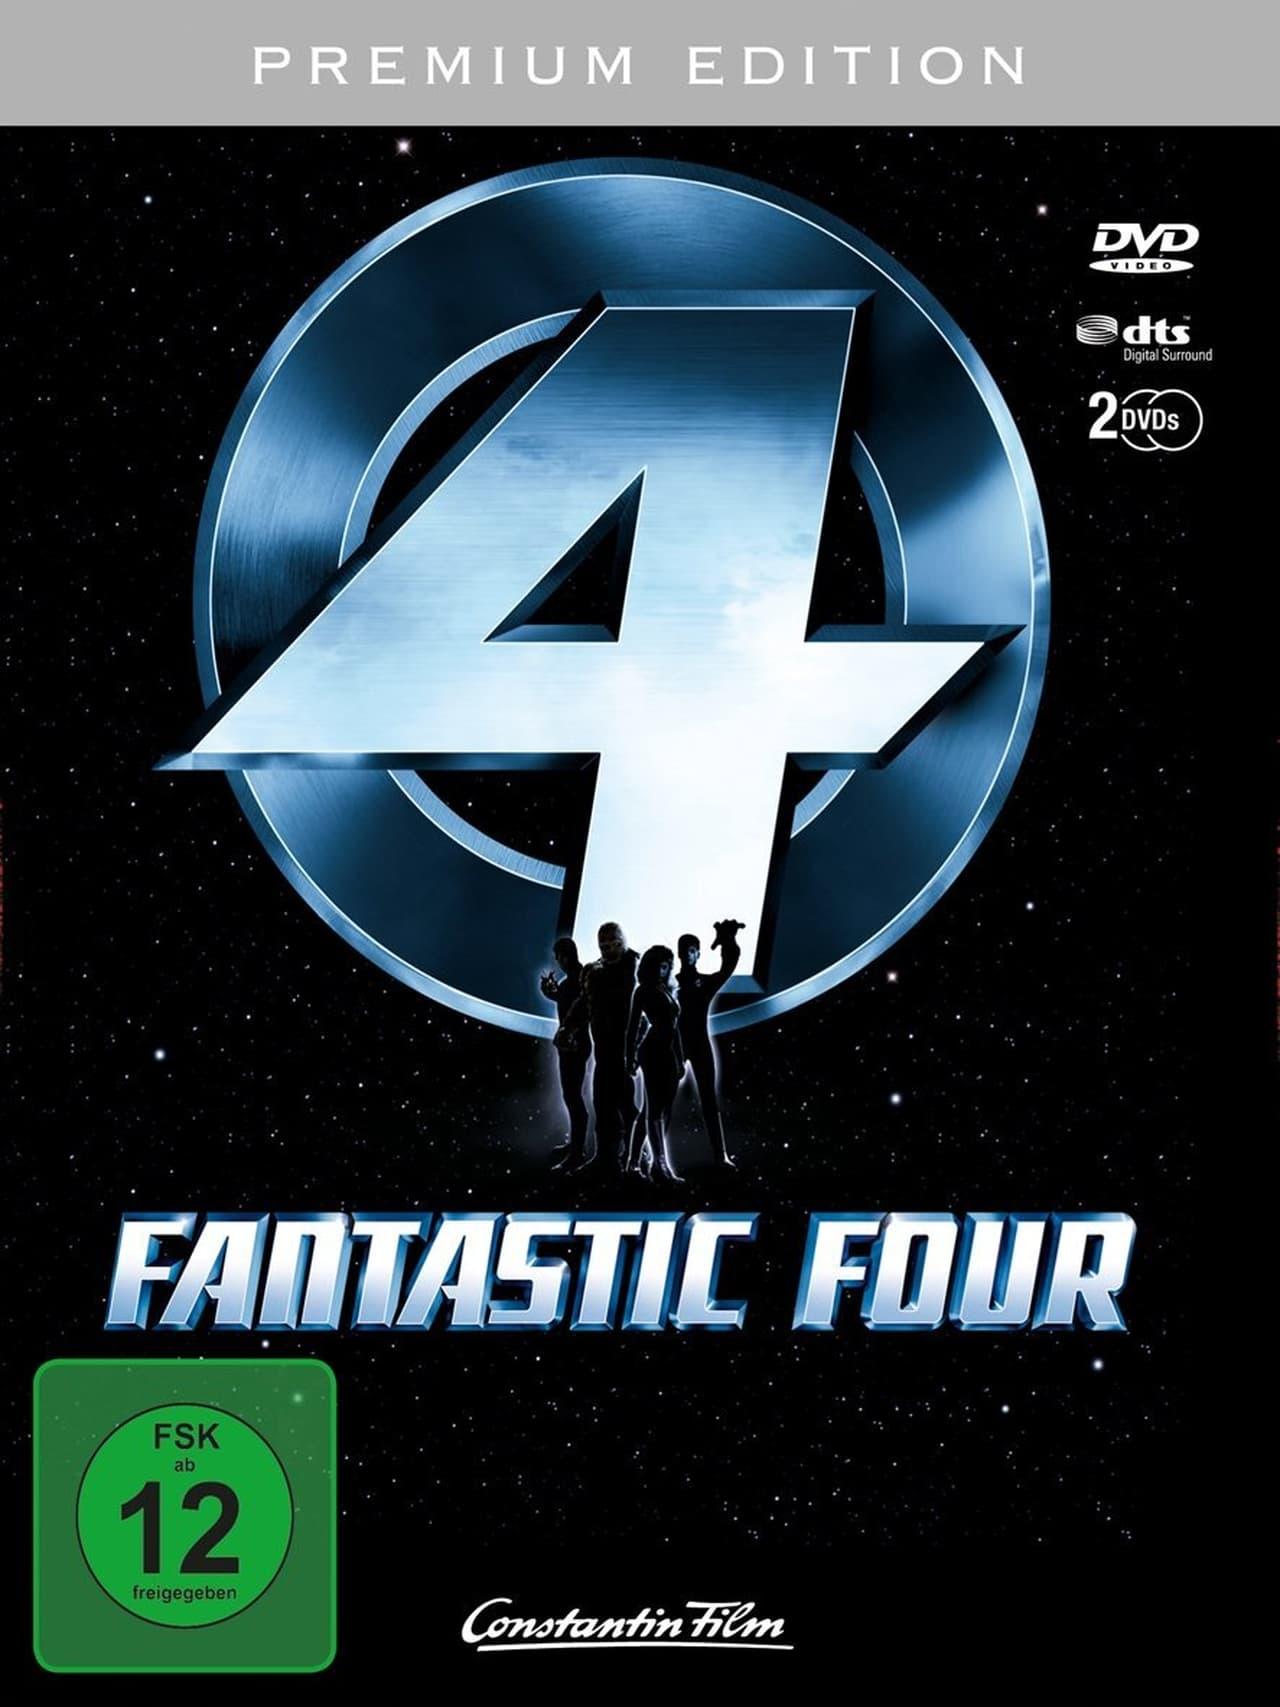 Fantastic Four 2005 Stream